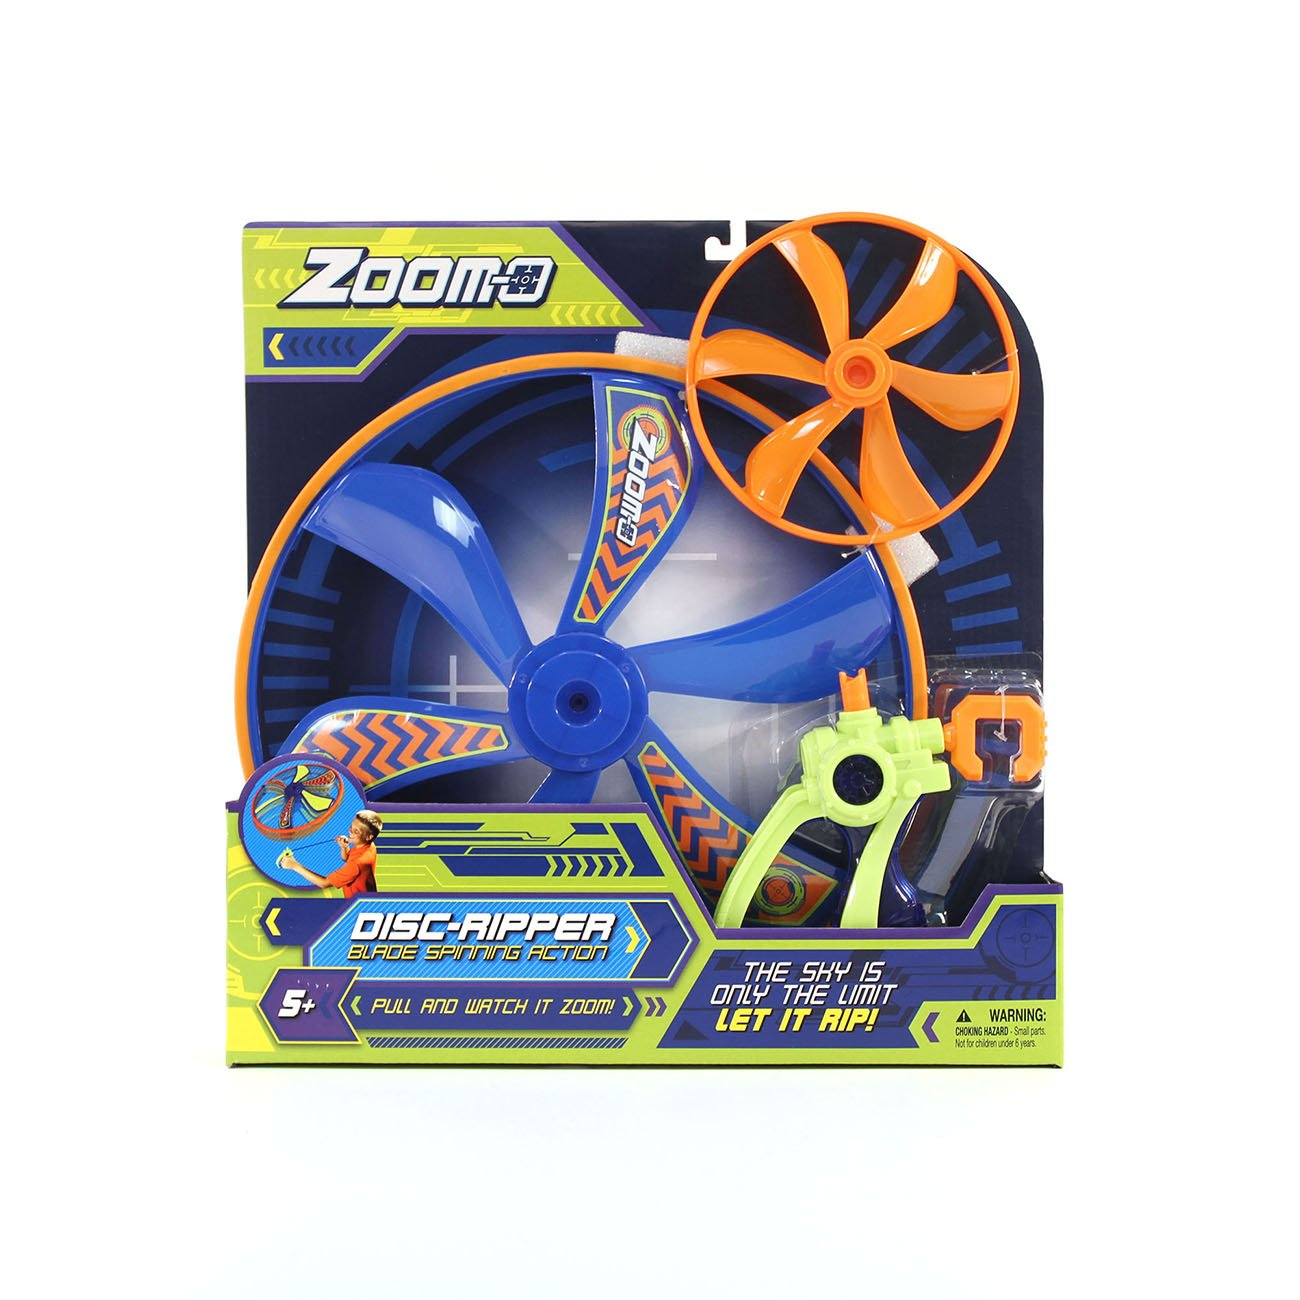 Zoomo Disc Ripper